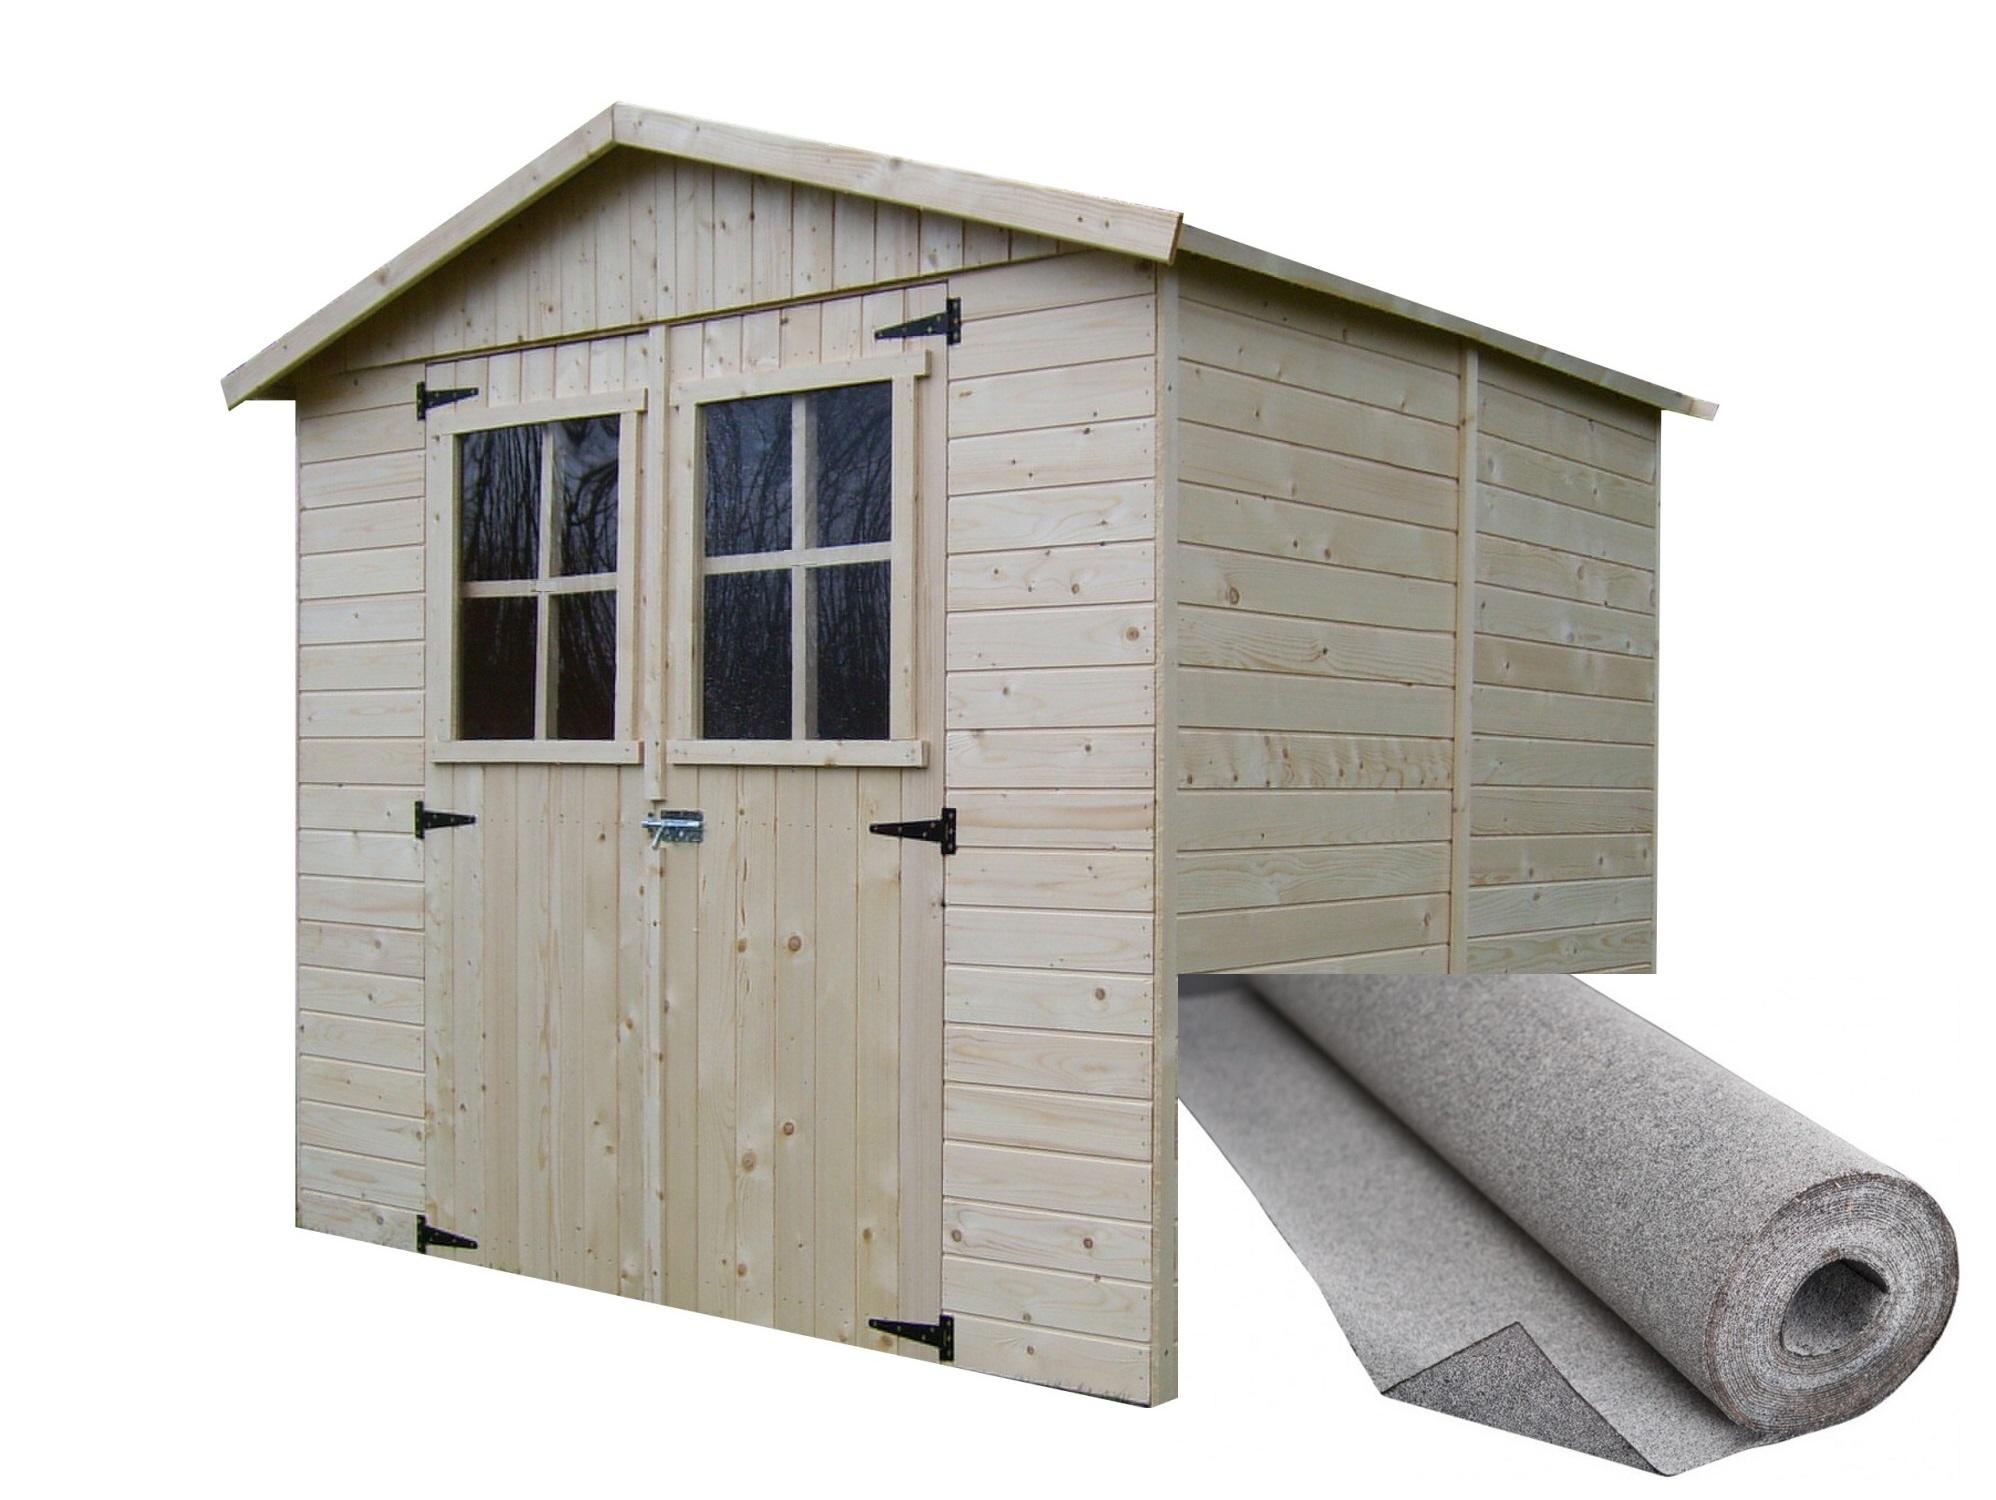 dřevěný domek SOLID EVA 229 x 194 cm (P851)